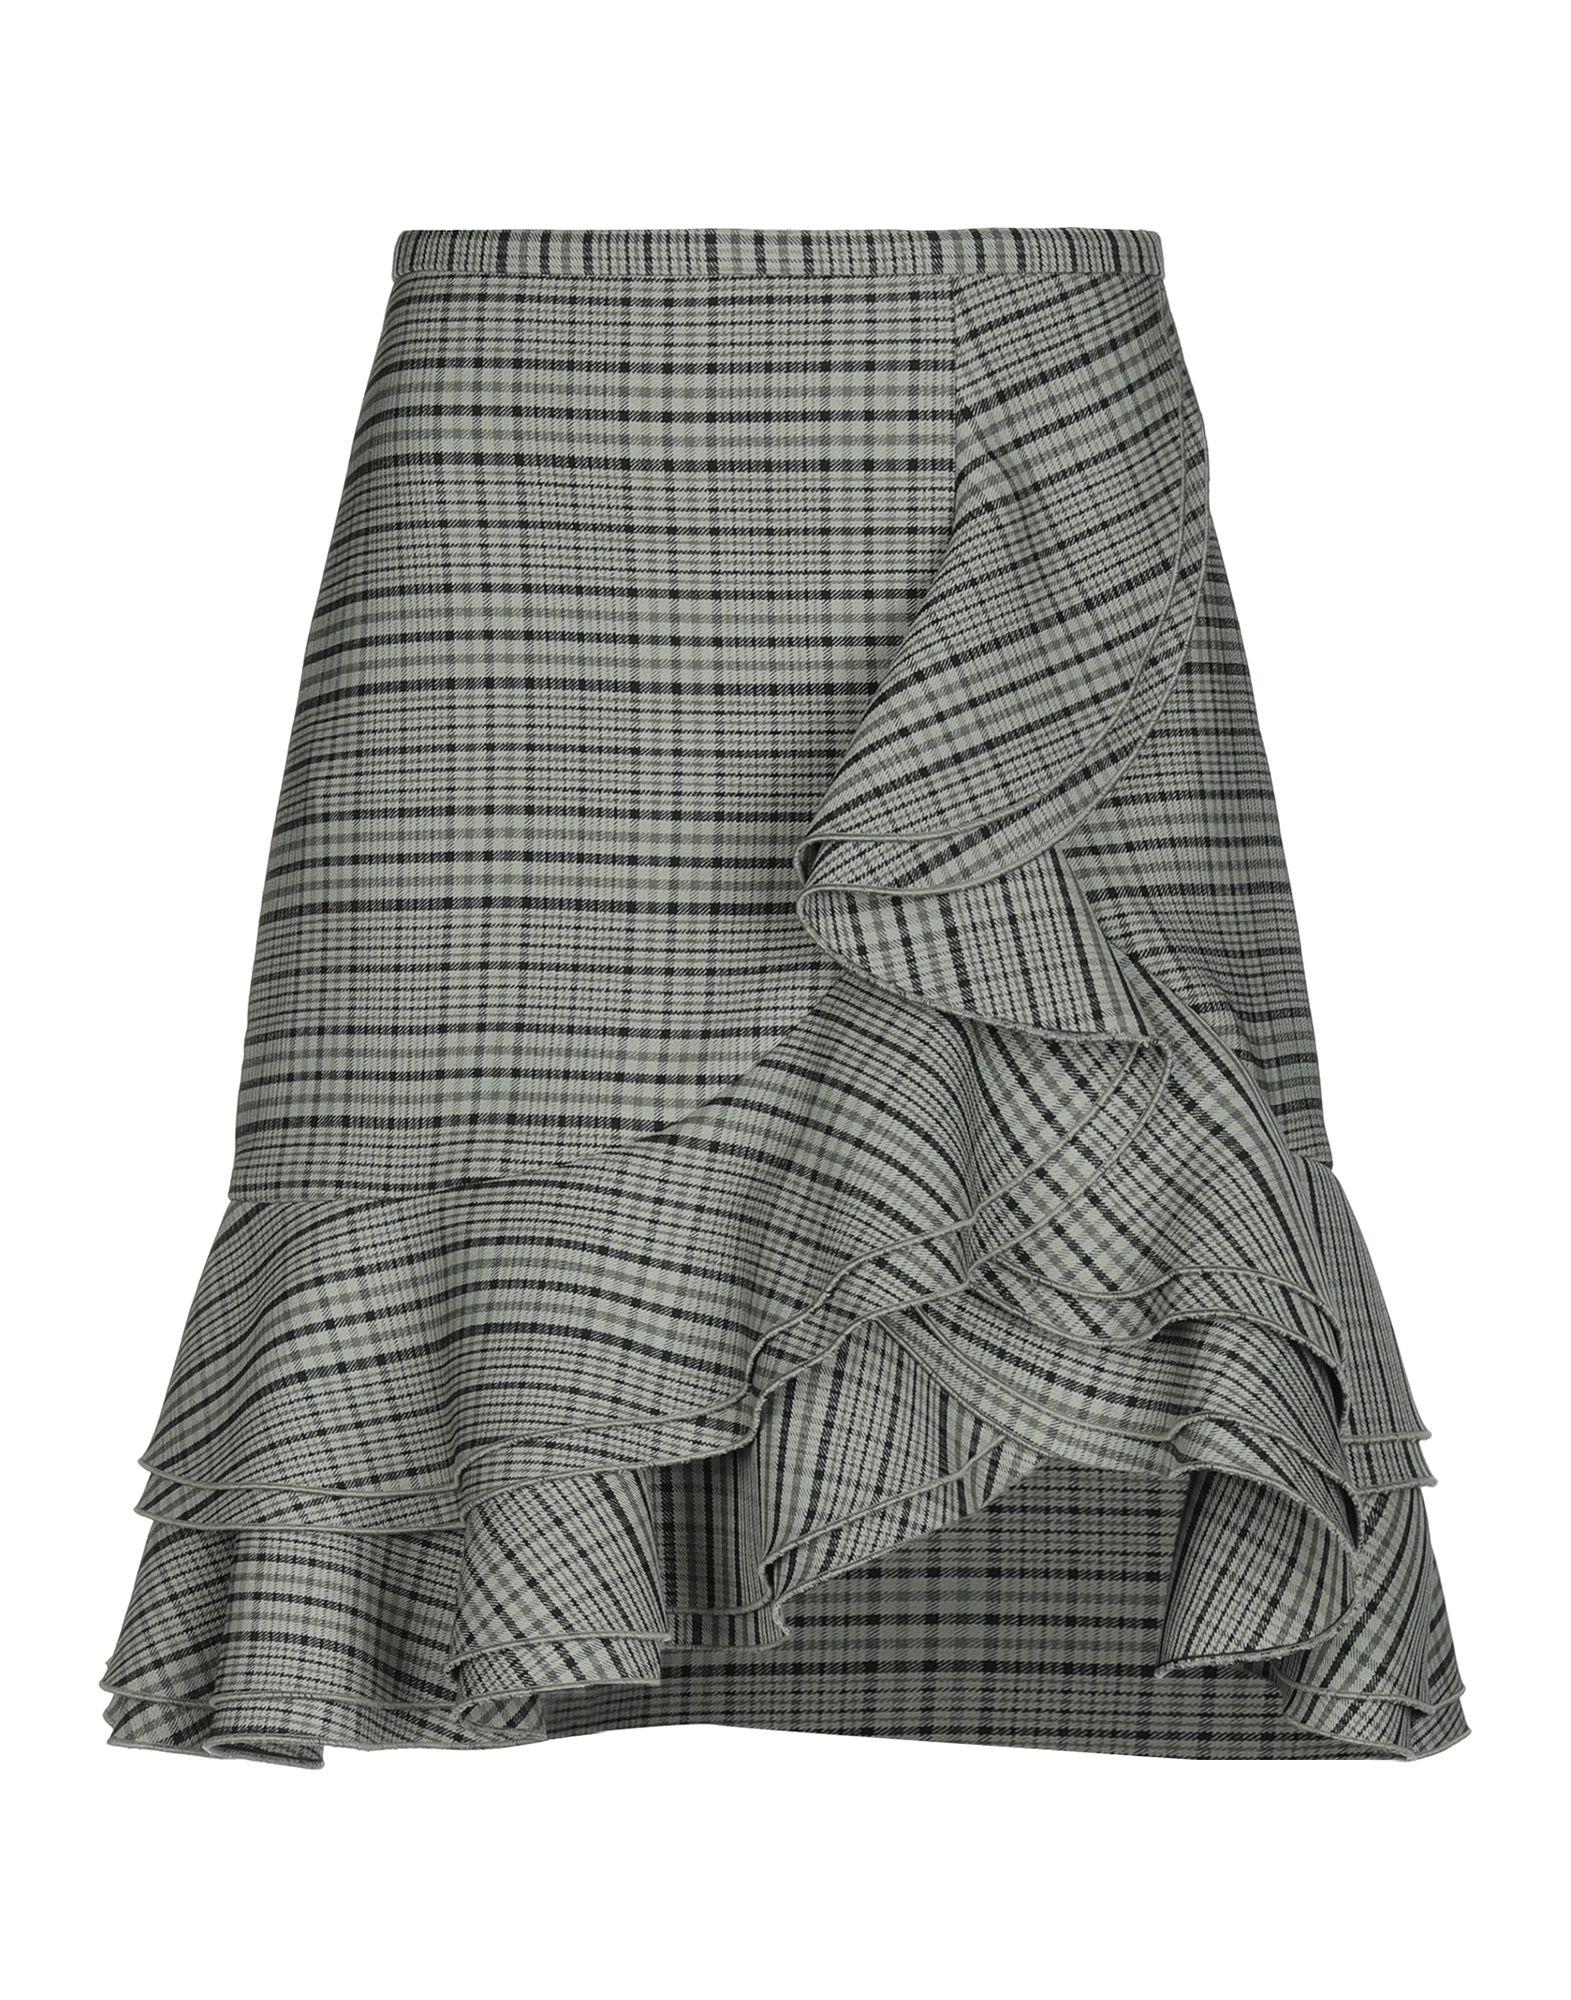 MICHAEL KORS COLLECTION Мини-юбка hope collection мини юбка